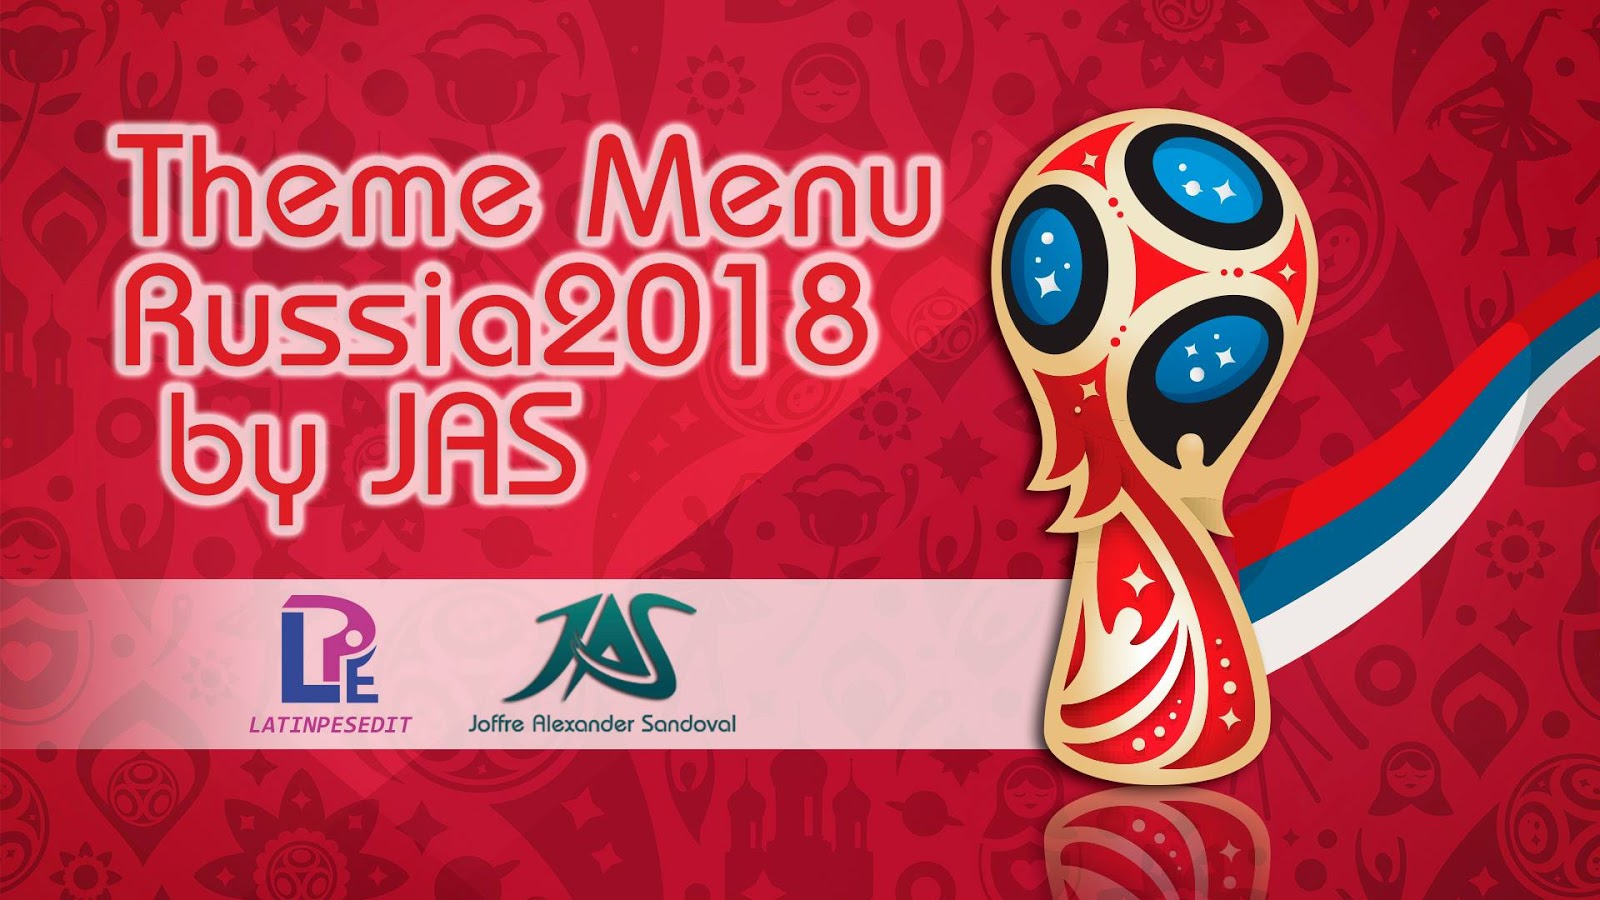 PES 2018 Theme Menu Russia 2018 by JAS